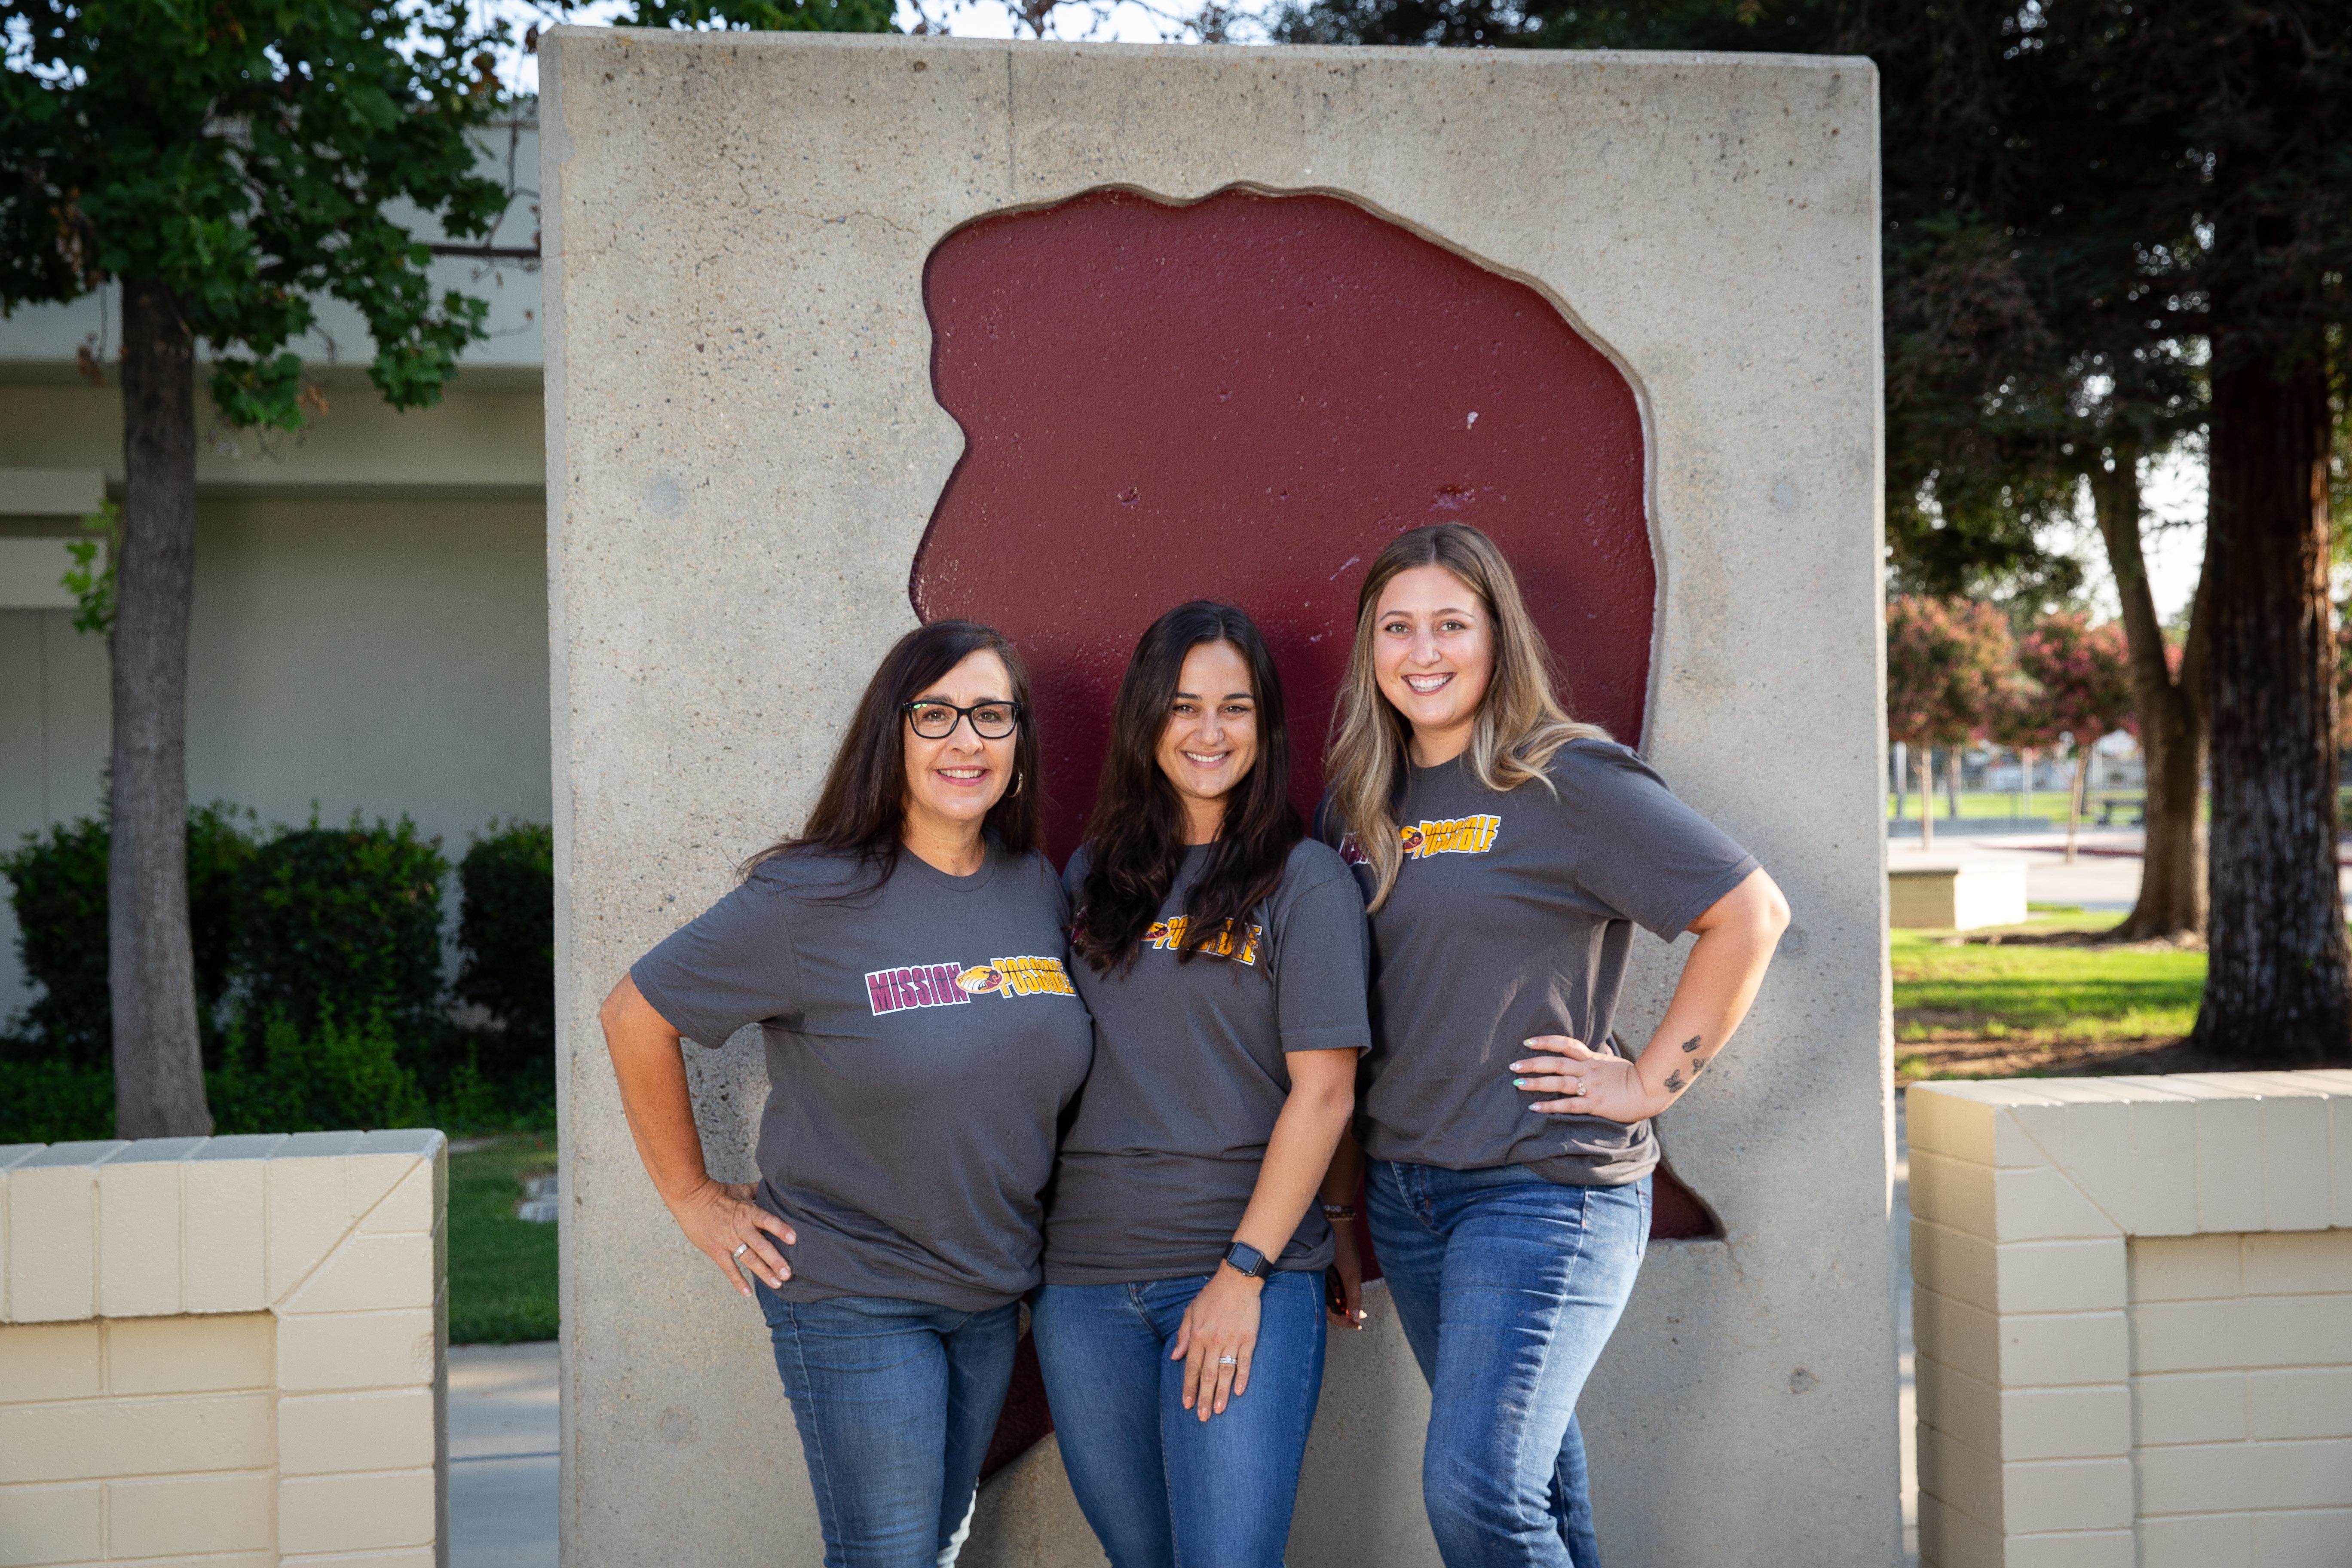 Fourth grade teacher Colleen McComas, Tannaz Eghtesadi, and Leah Johnson